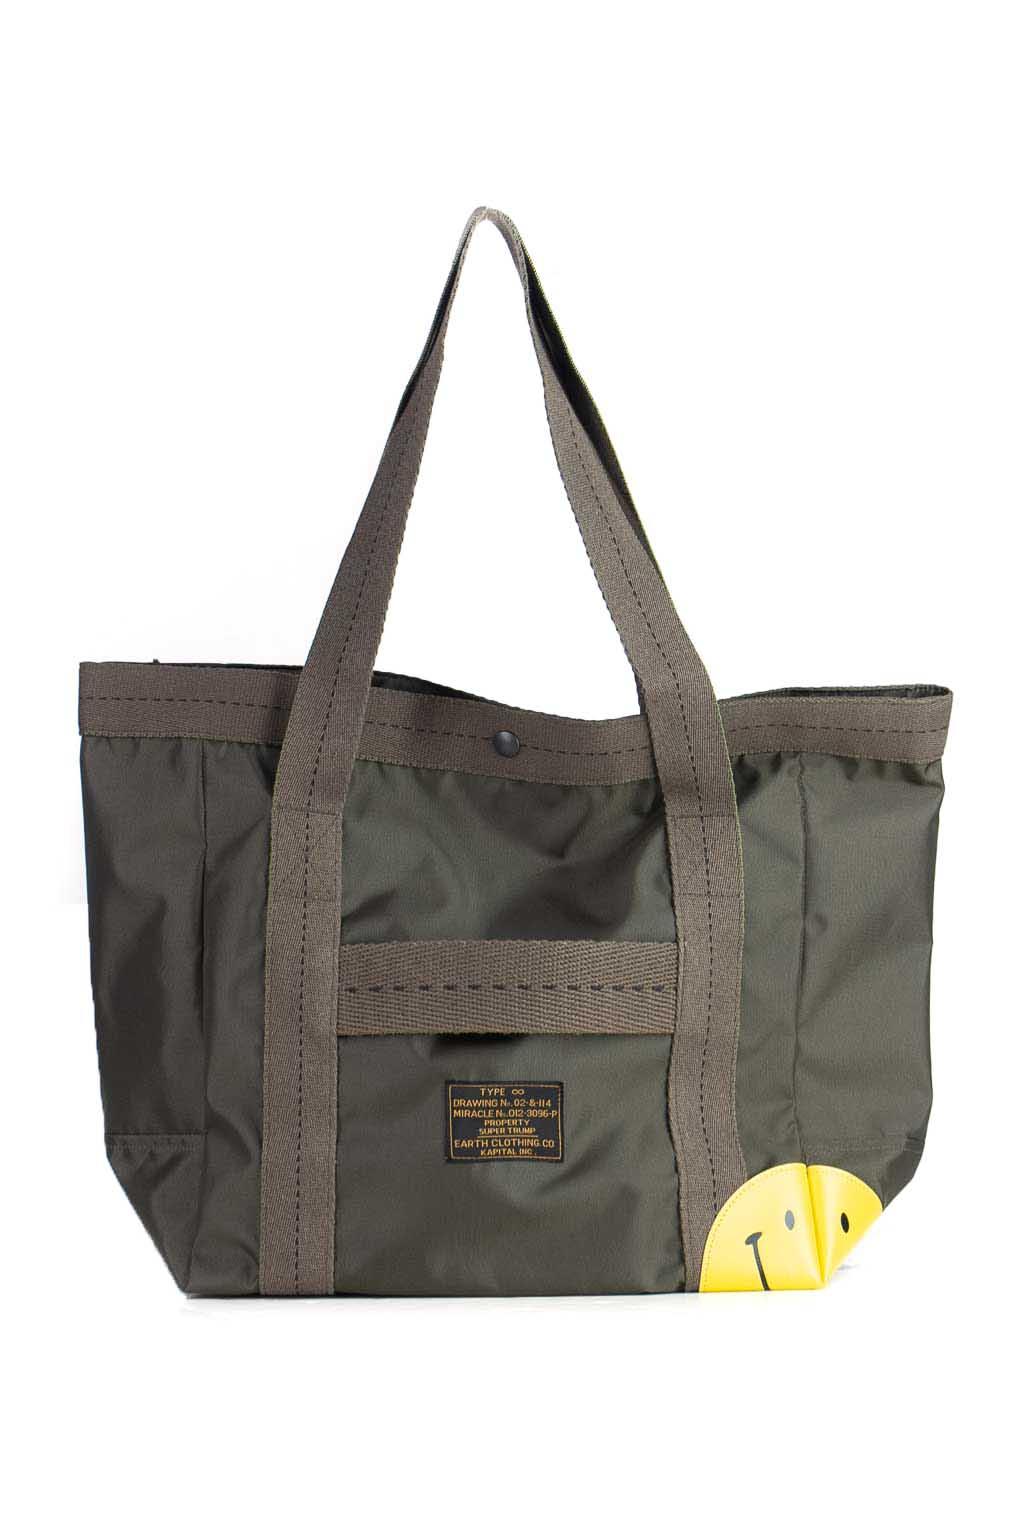 Nylon Ox Army Smile Tote Bag (S)   Khaki by Kapital